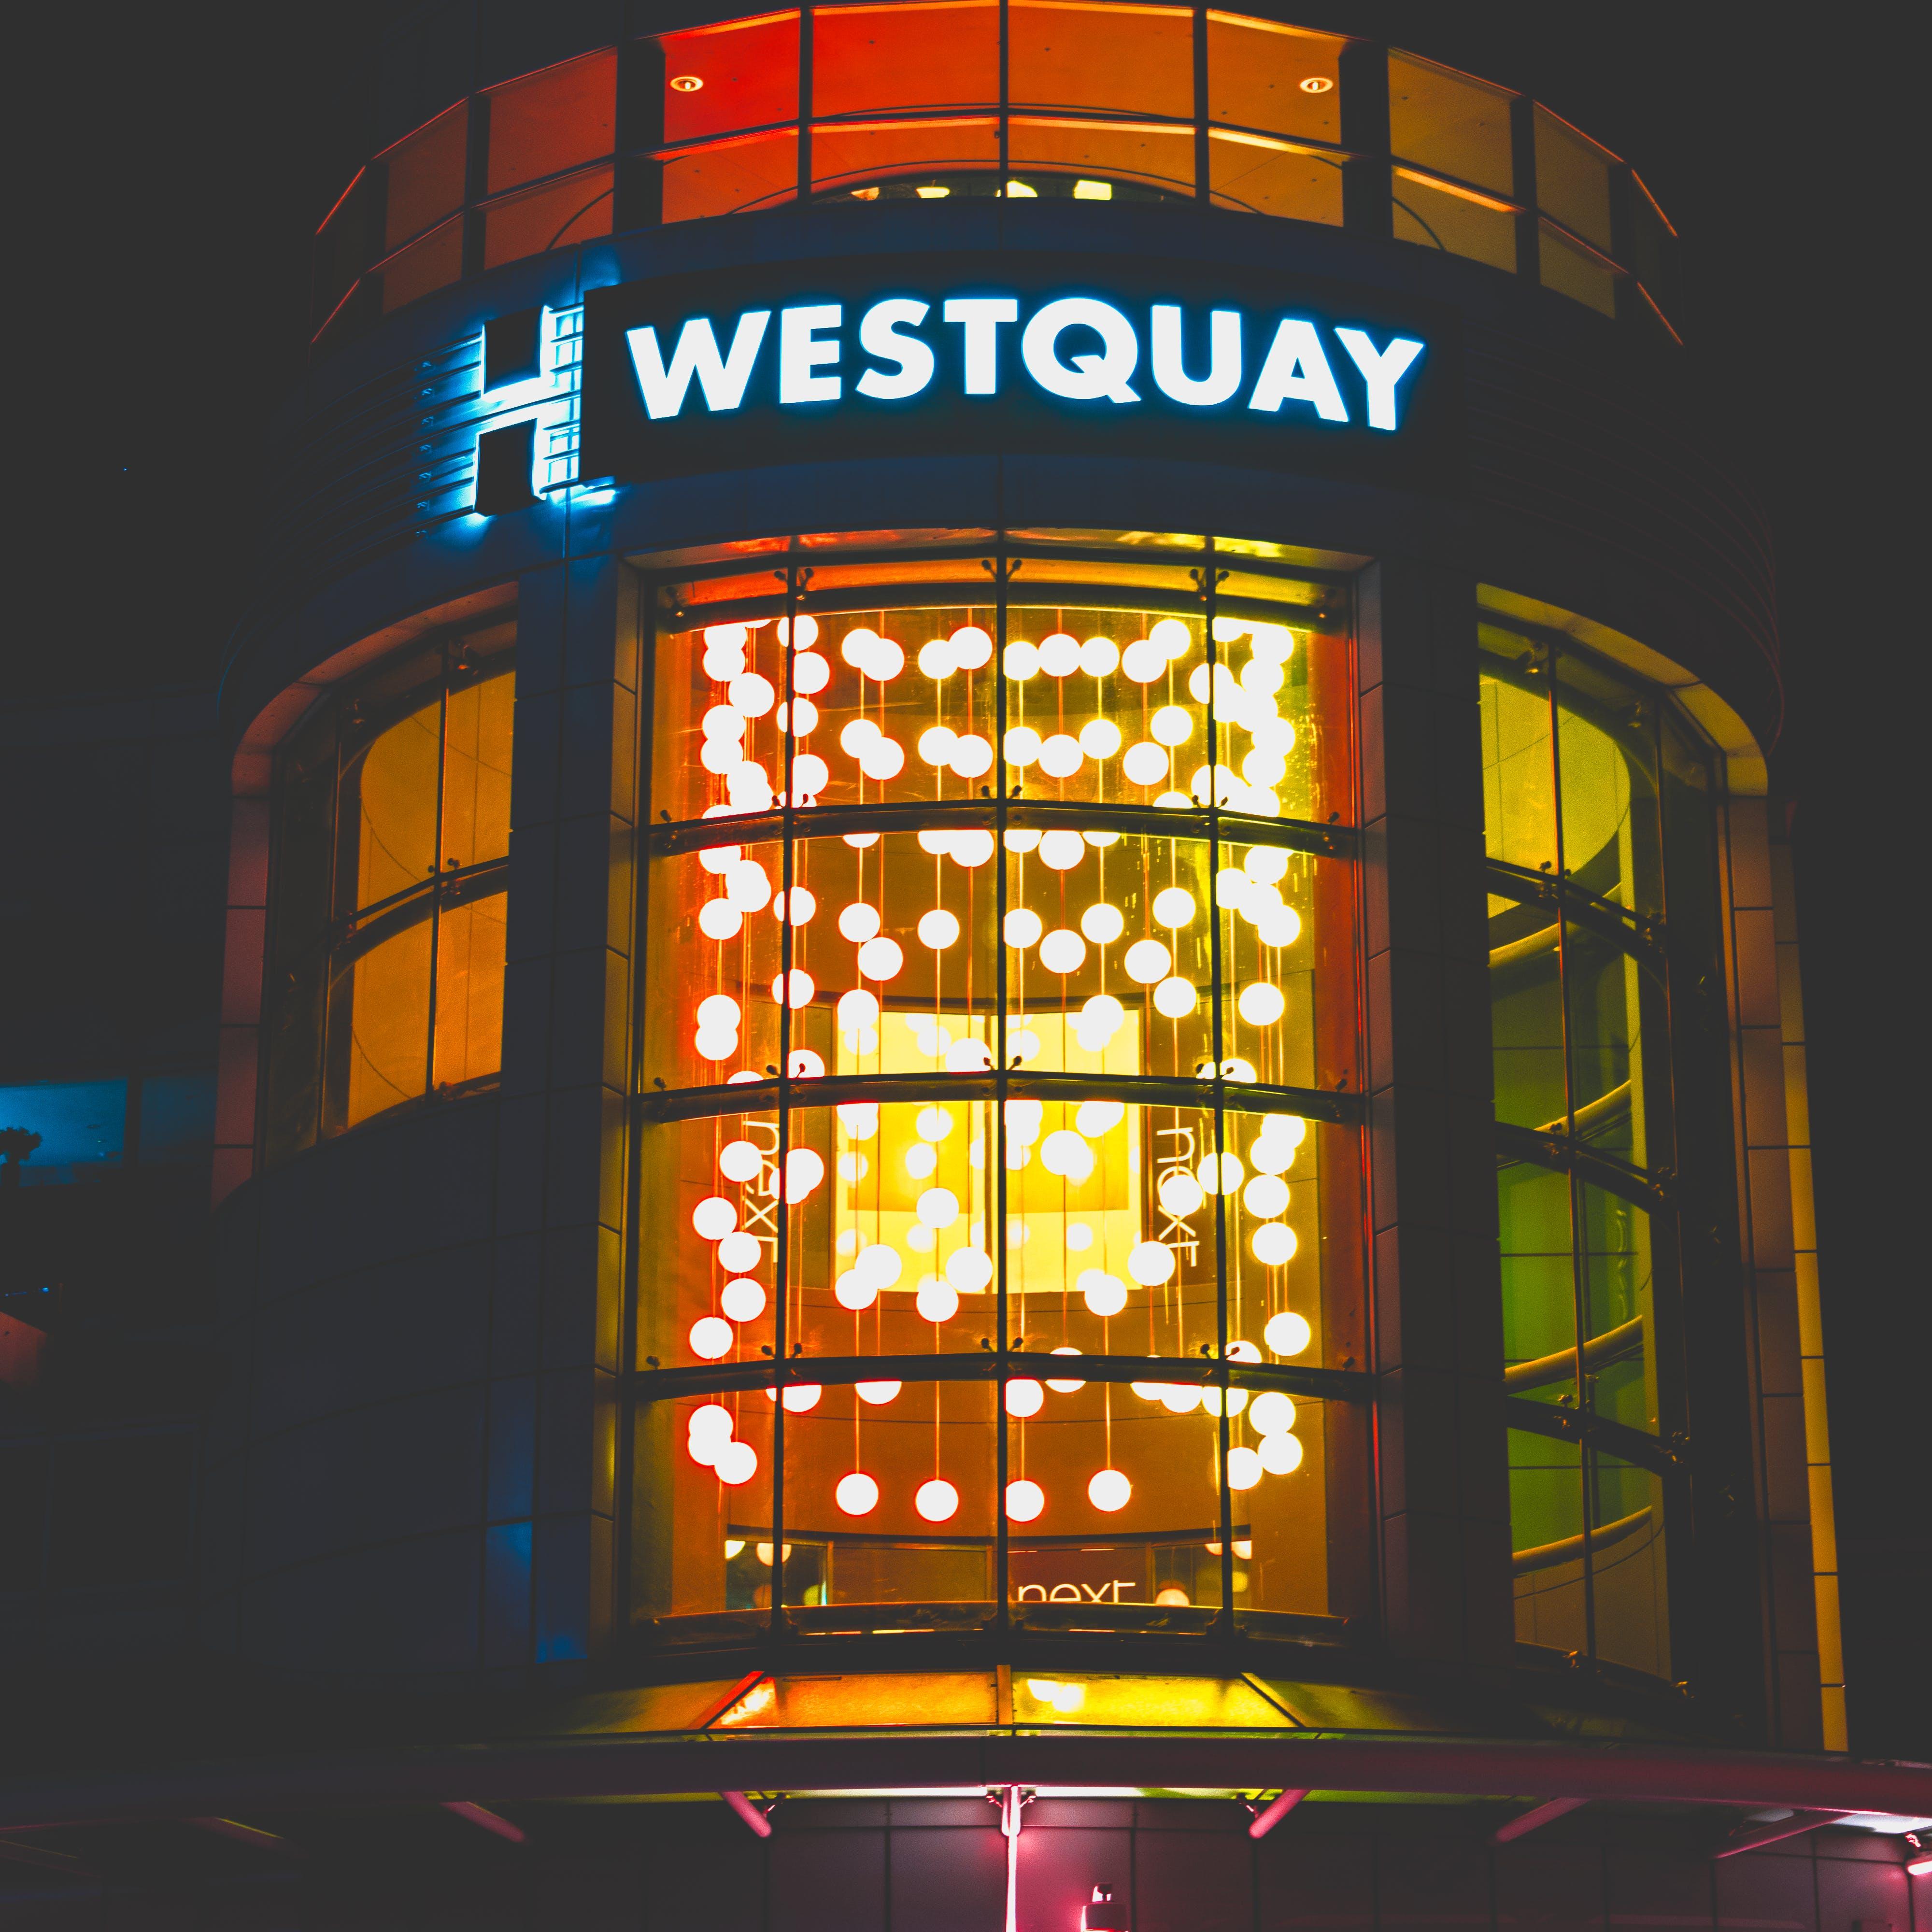 Lighted Westquay Neon Light Signage